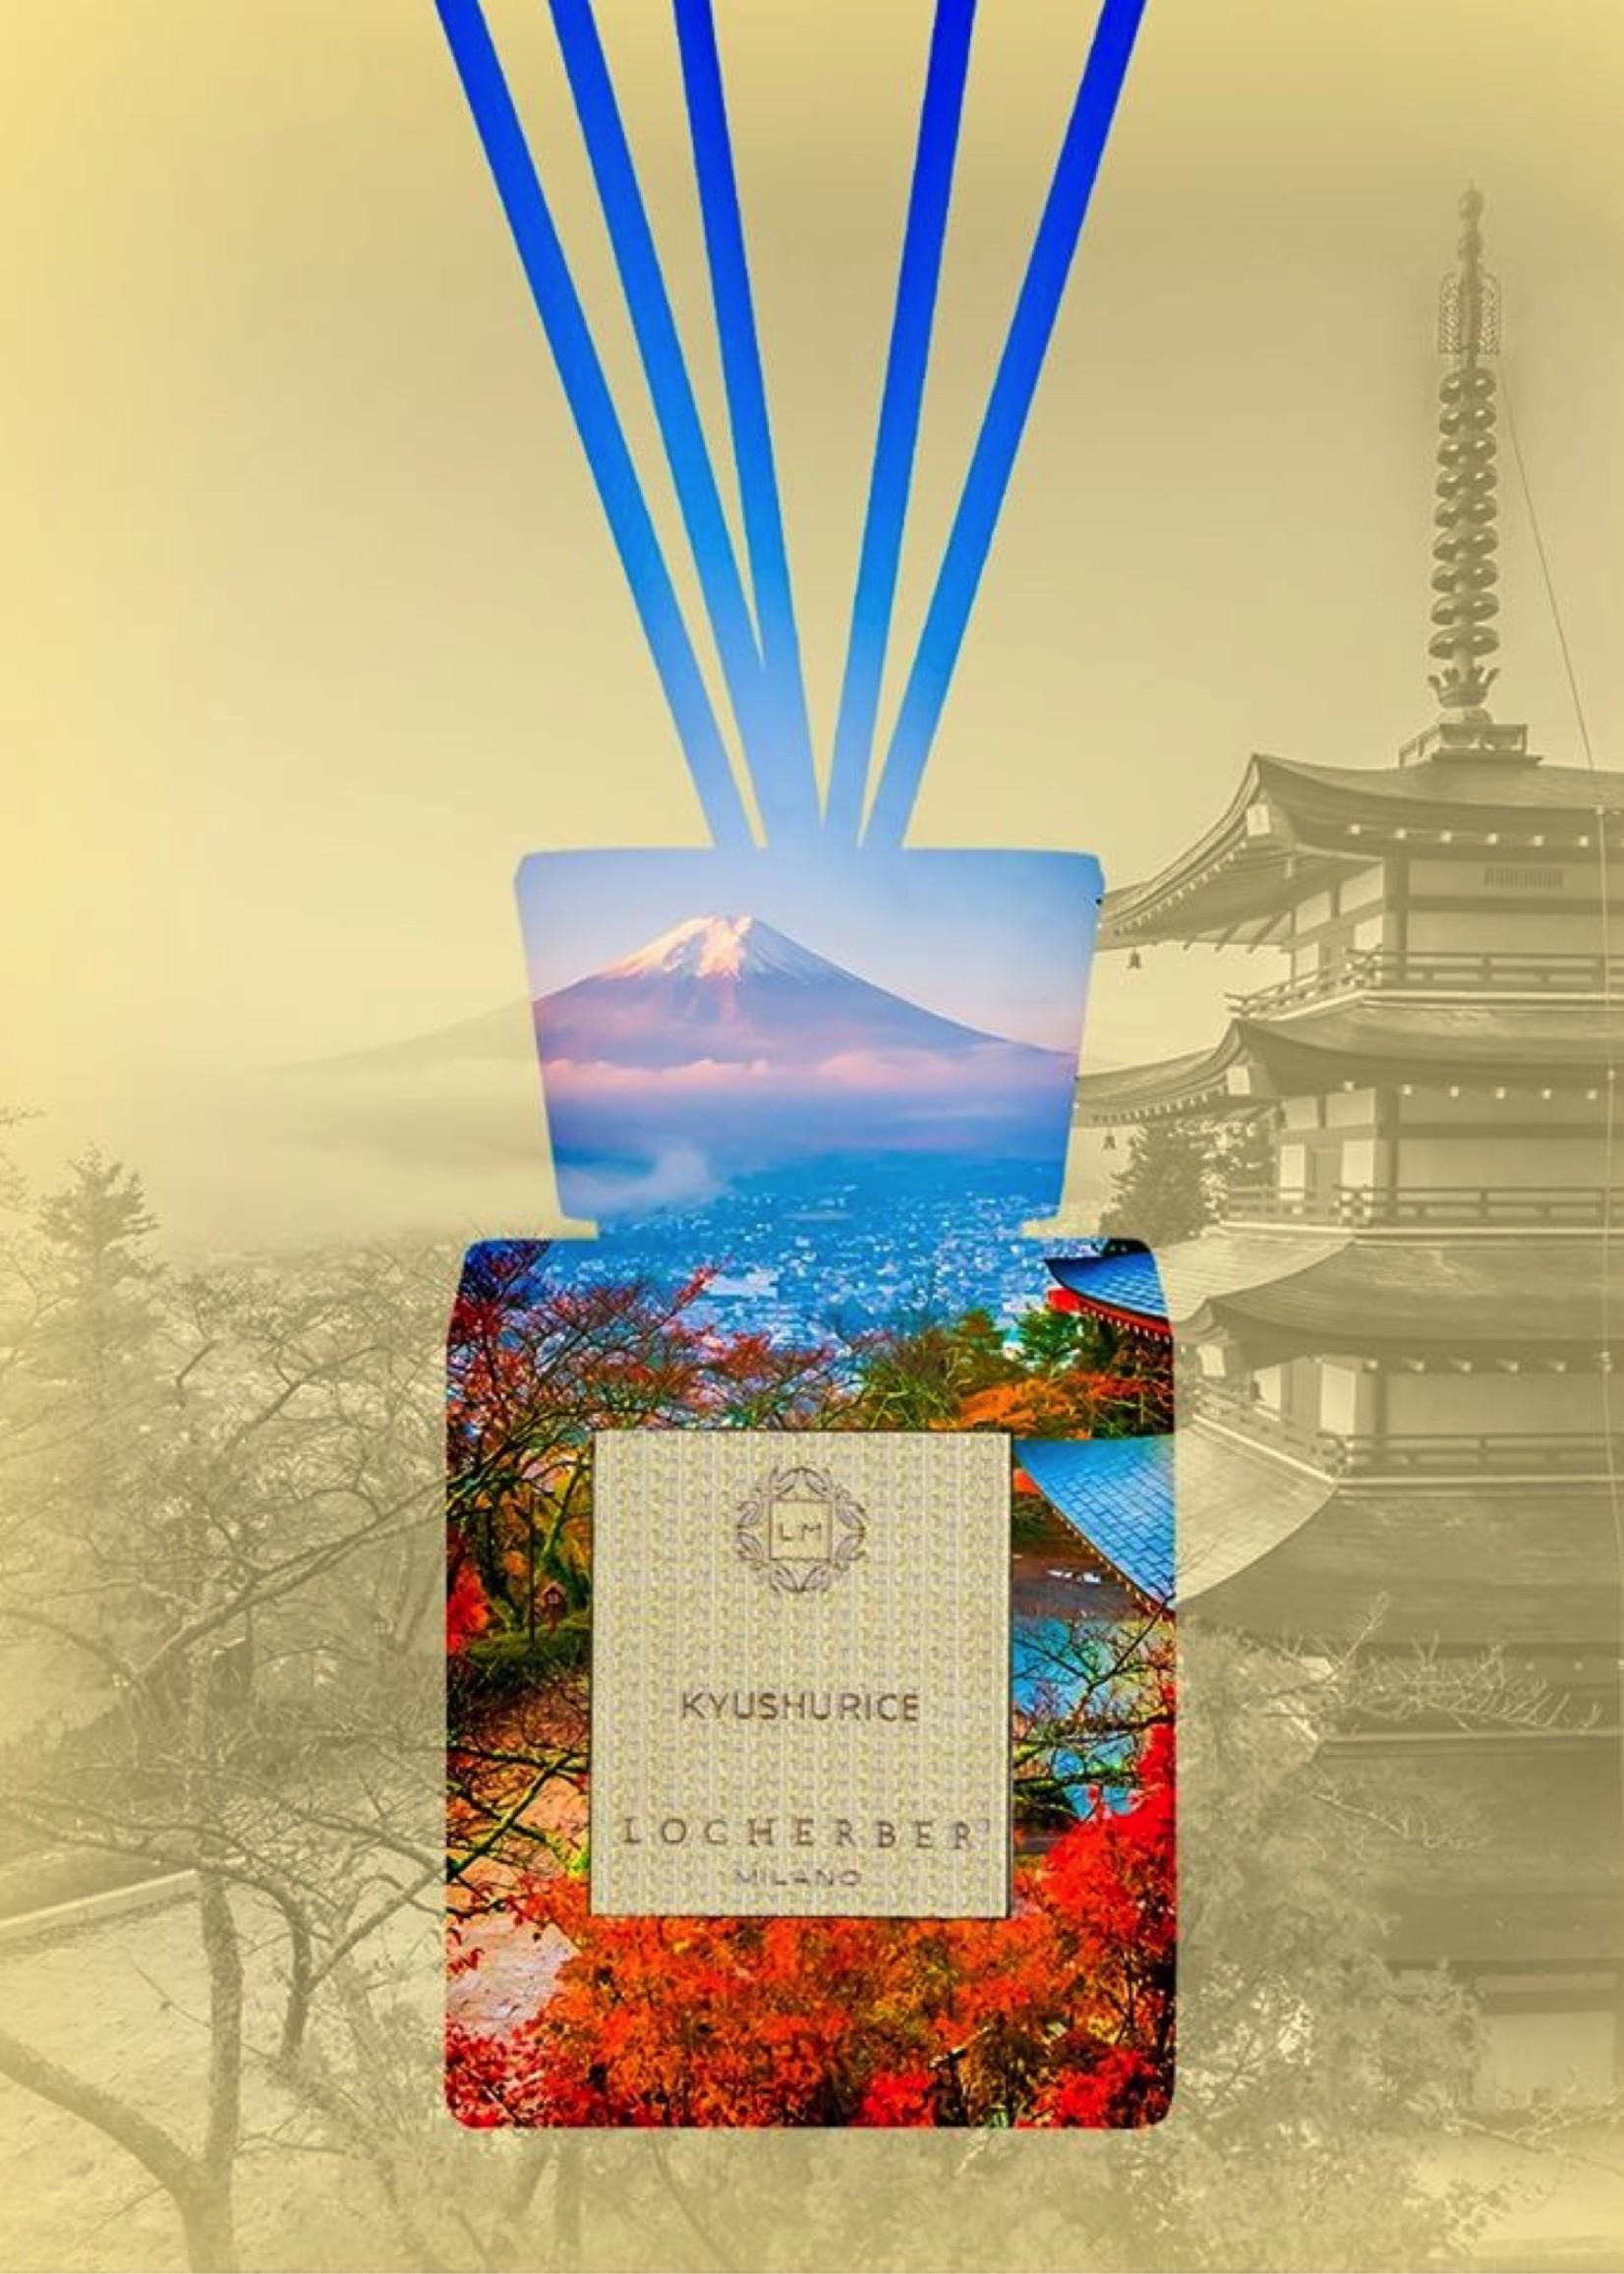 Locherber Locherber Milano - Kyushu Rice - Diffuser met Geurstokjes